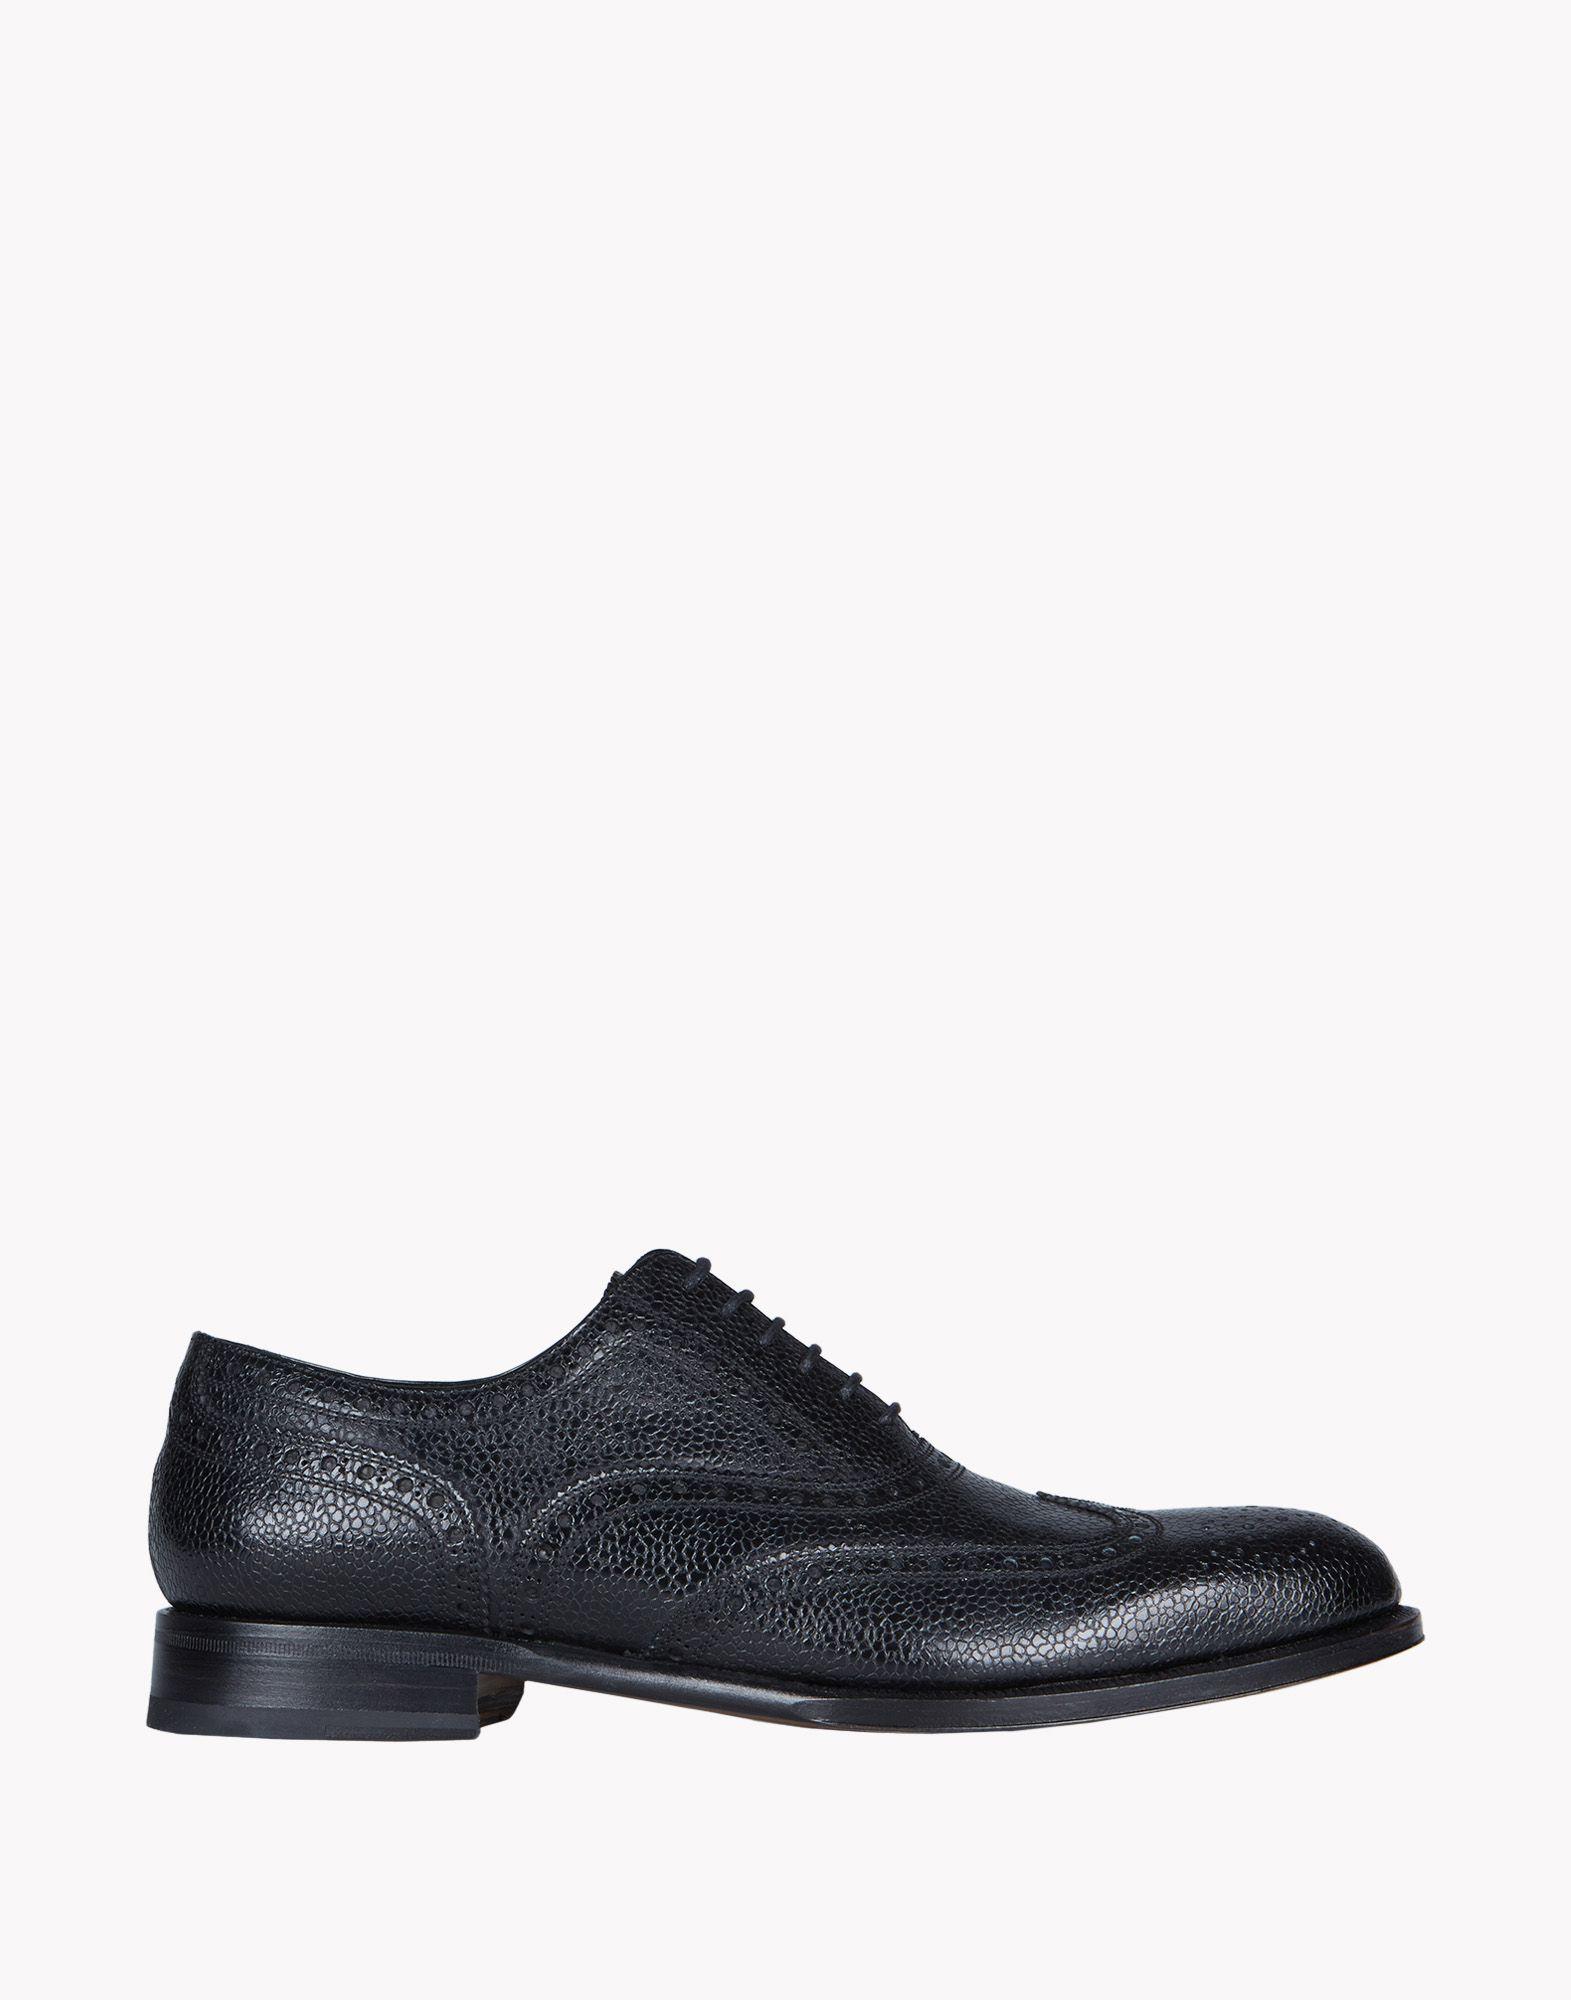 Chaussures À Lacets Dsquared2 Homme - Chaussures À Lacets Dsquared2 sur